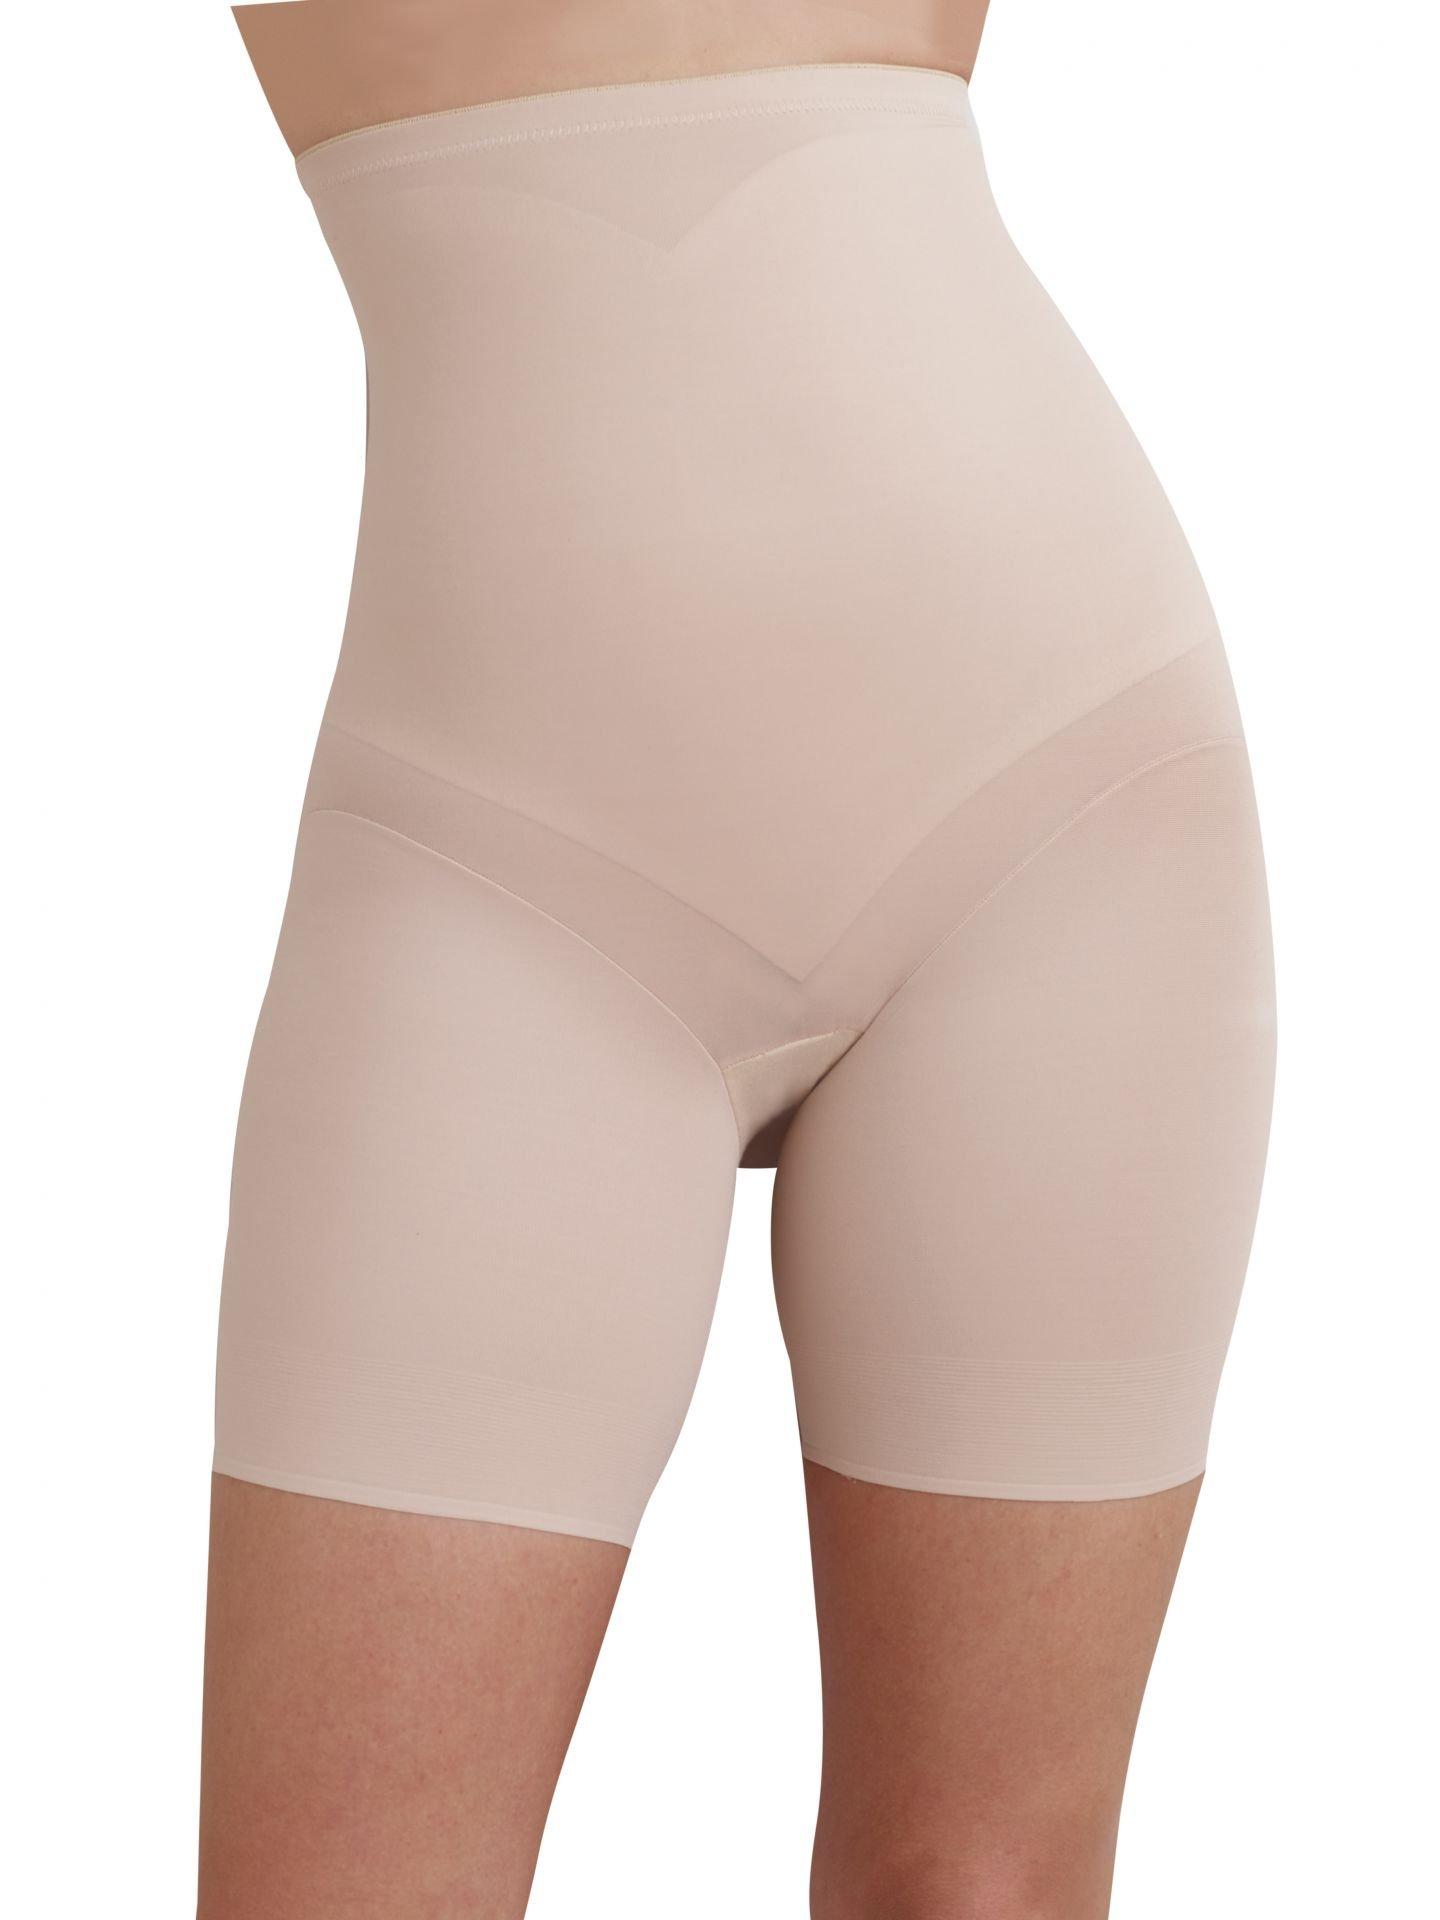 TC Fine Intimates Adjust Perfect Hi Waist Thigh Slimmer, Nude, Small